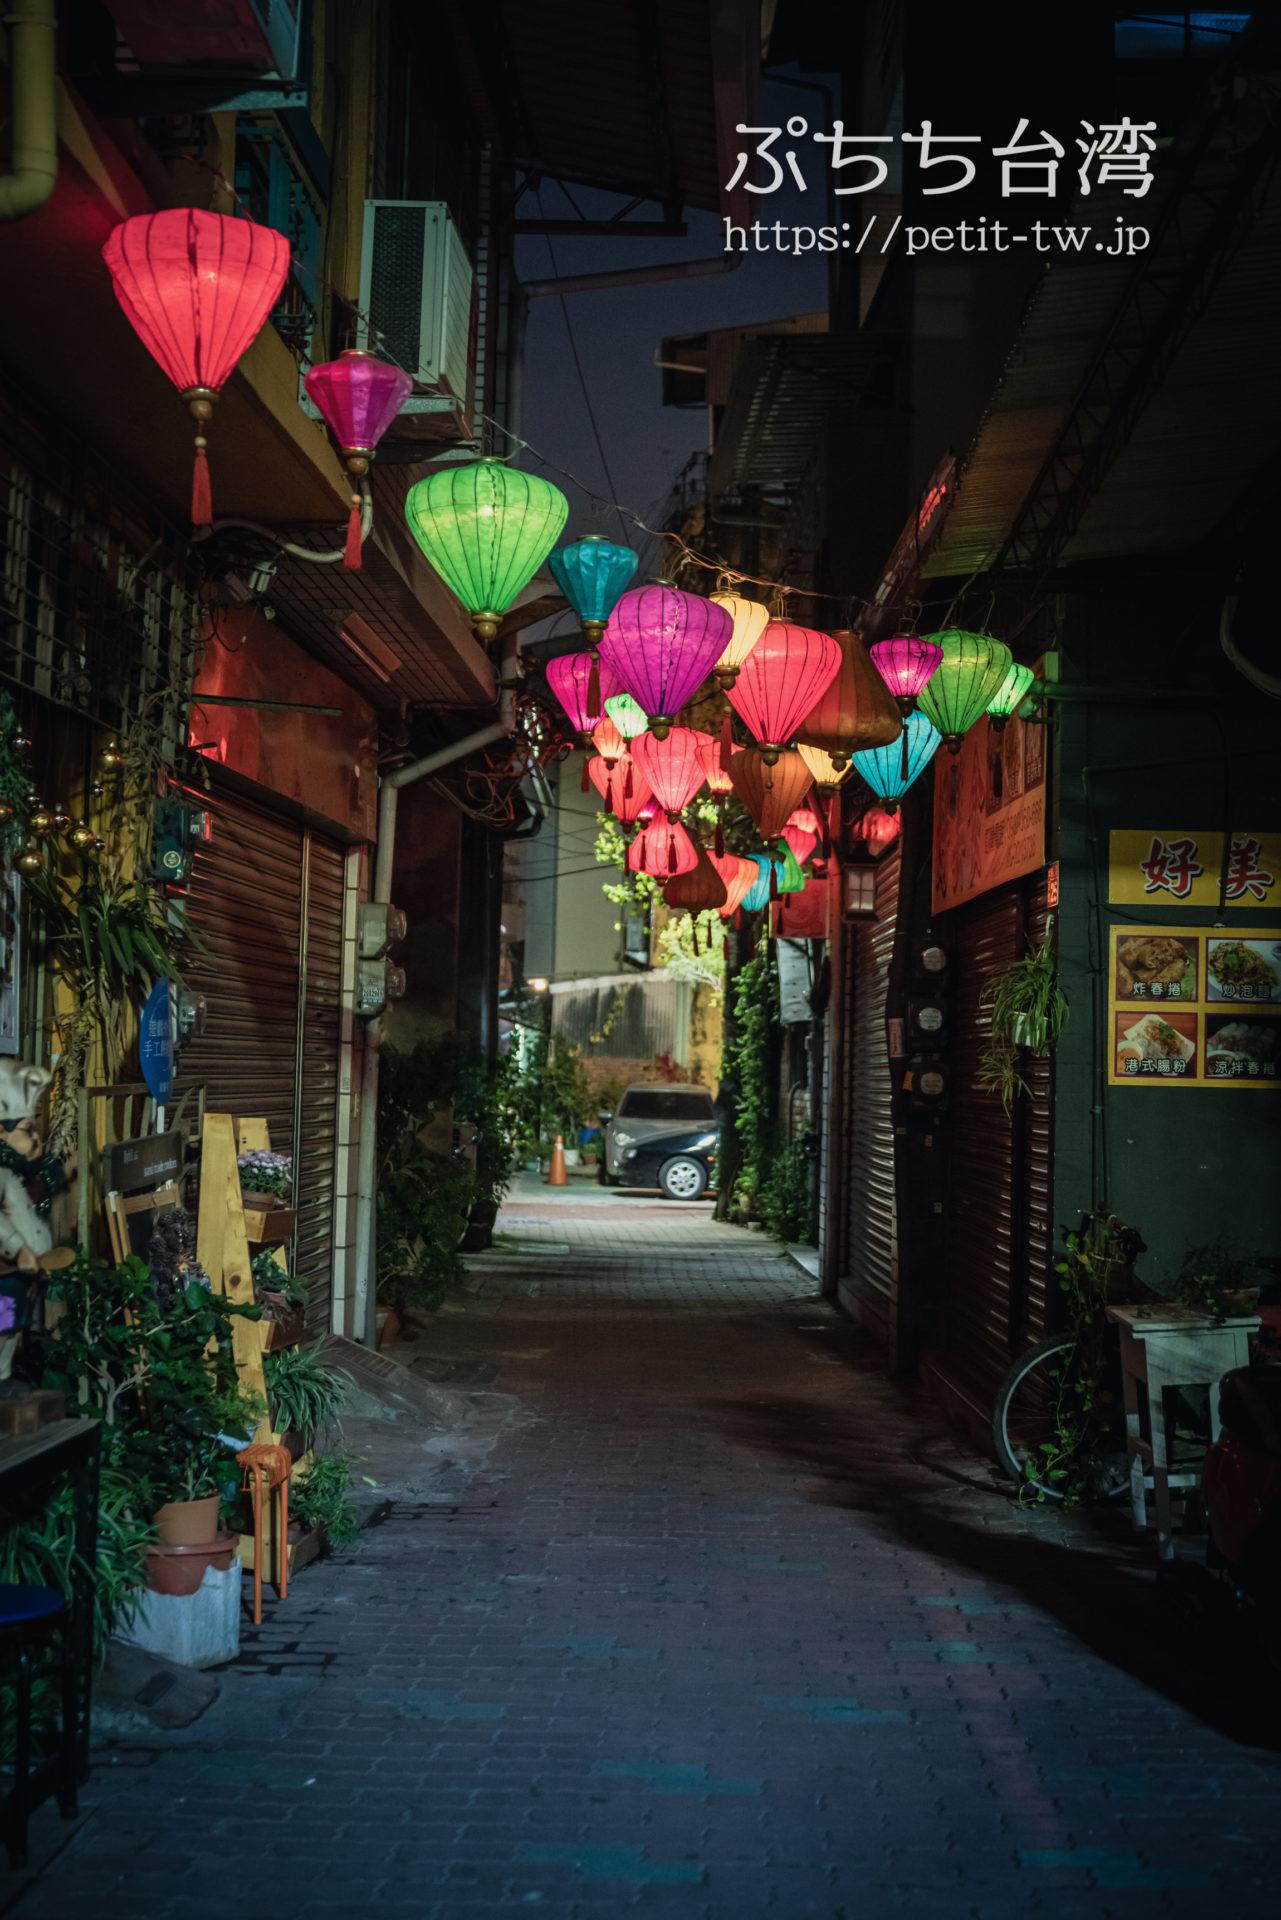 台南の信義街